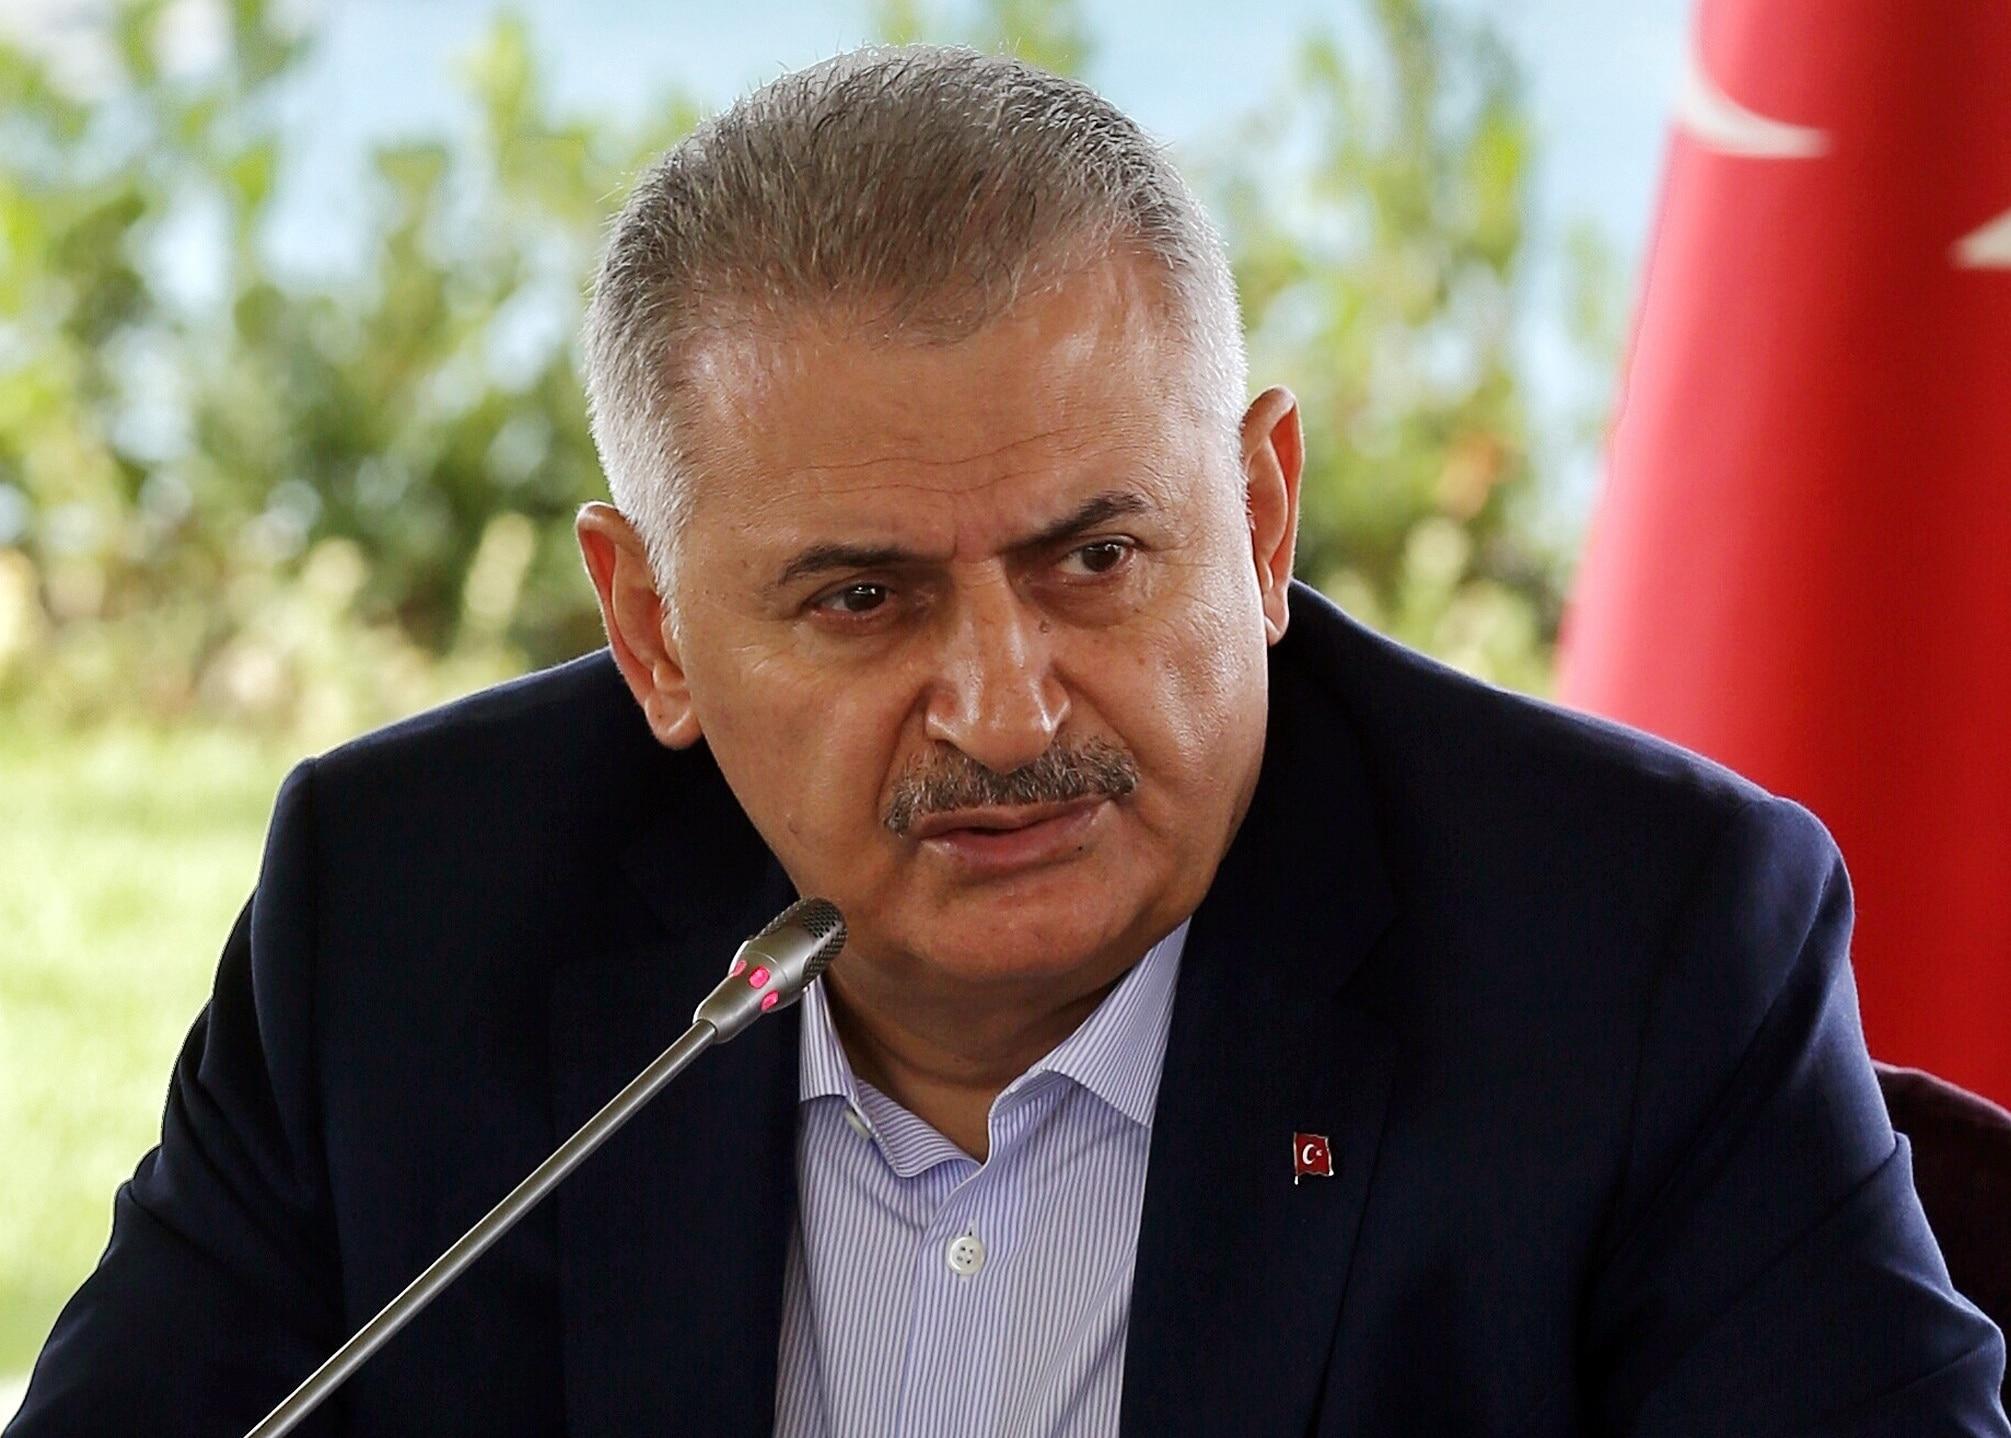 Turkish Prime Minister Binali Yildirim